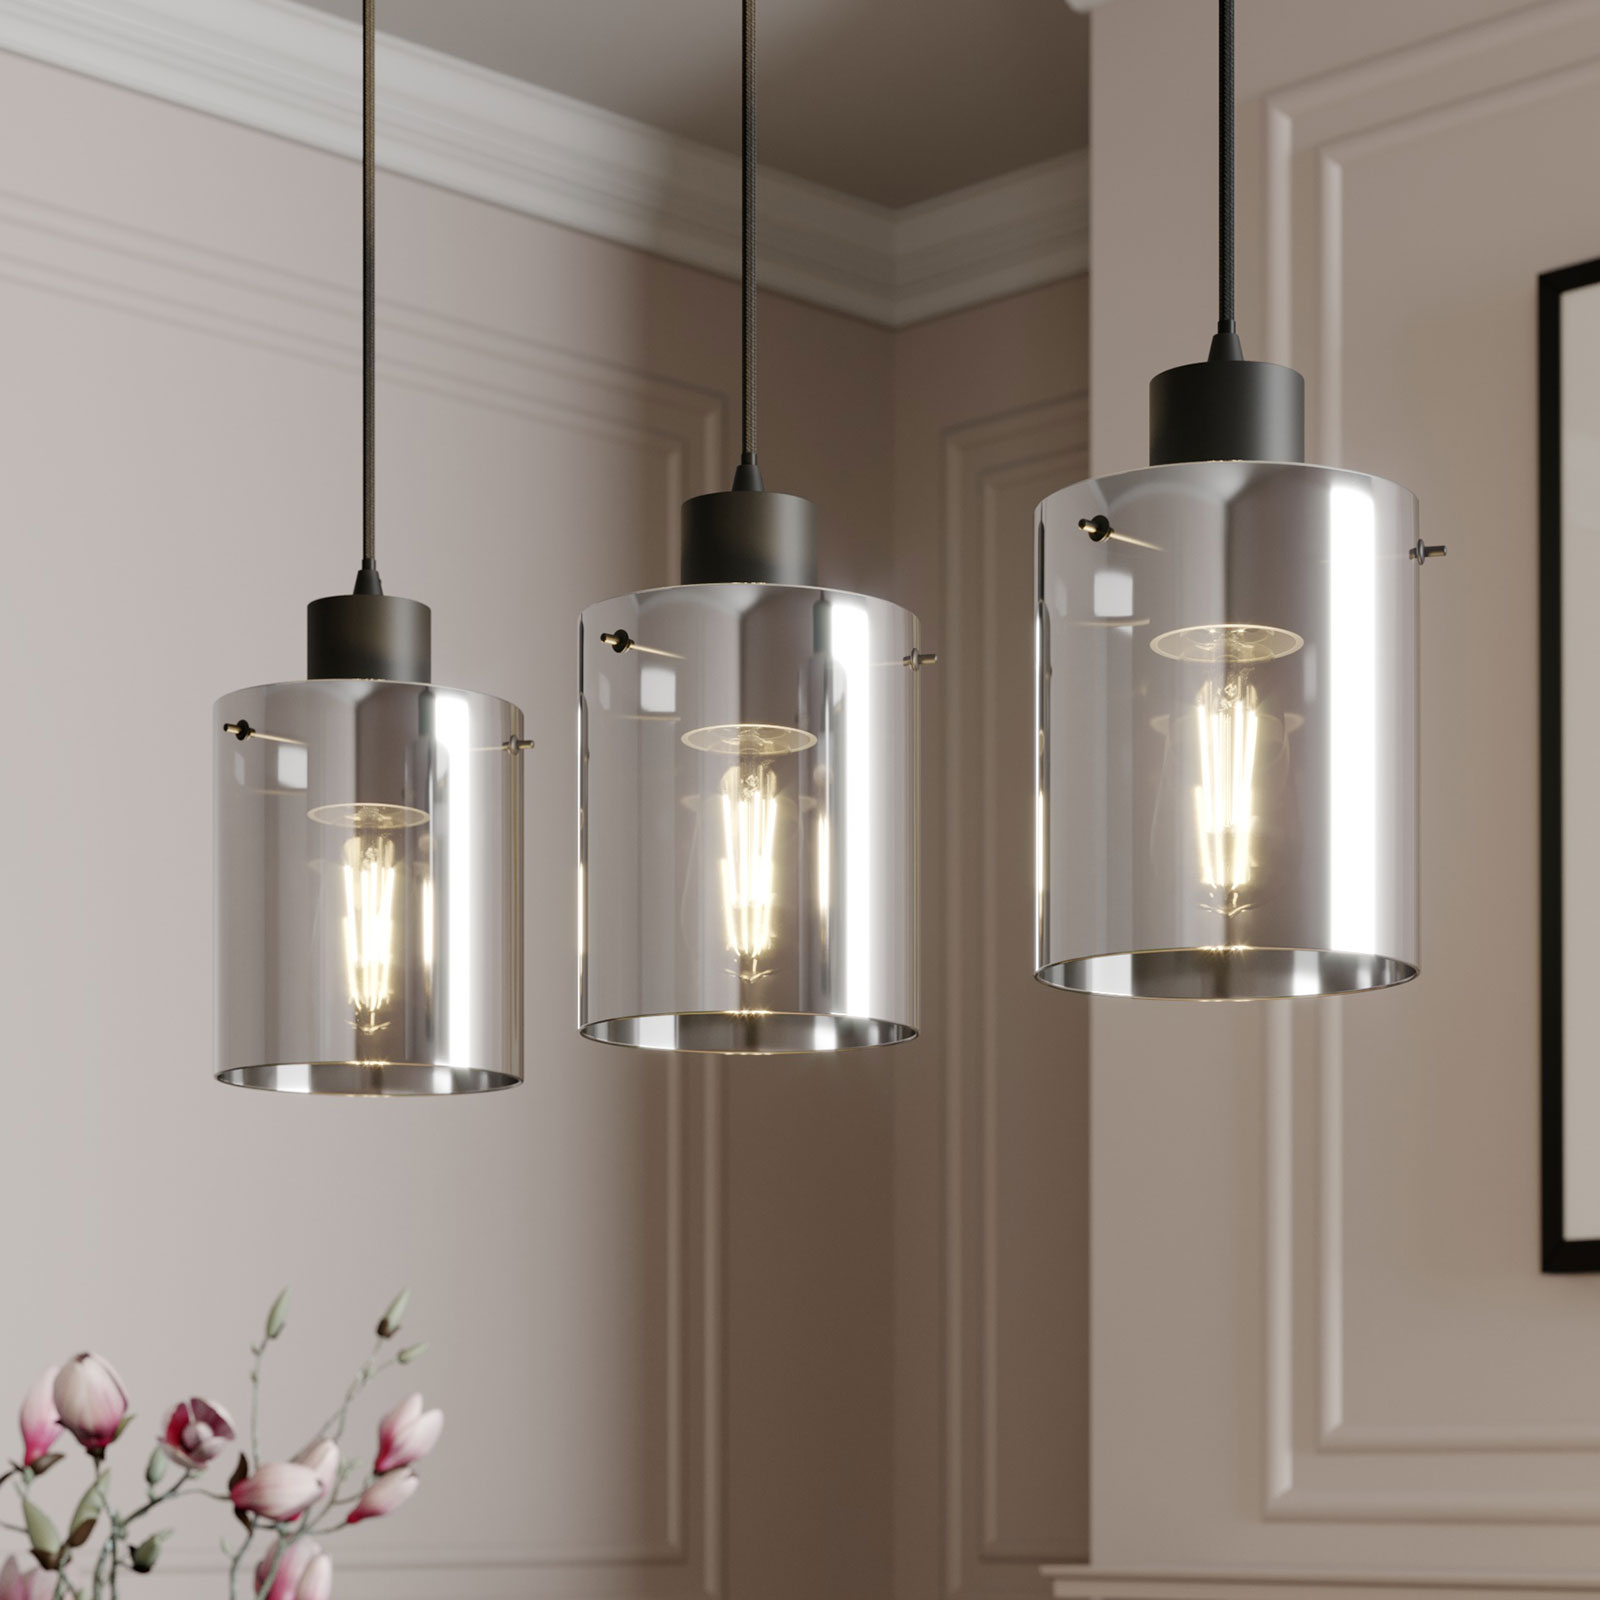 Lindby Kourtney hengelampe med glasskjerm, 3 lys